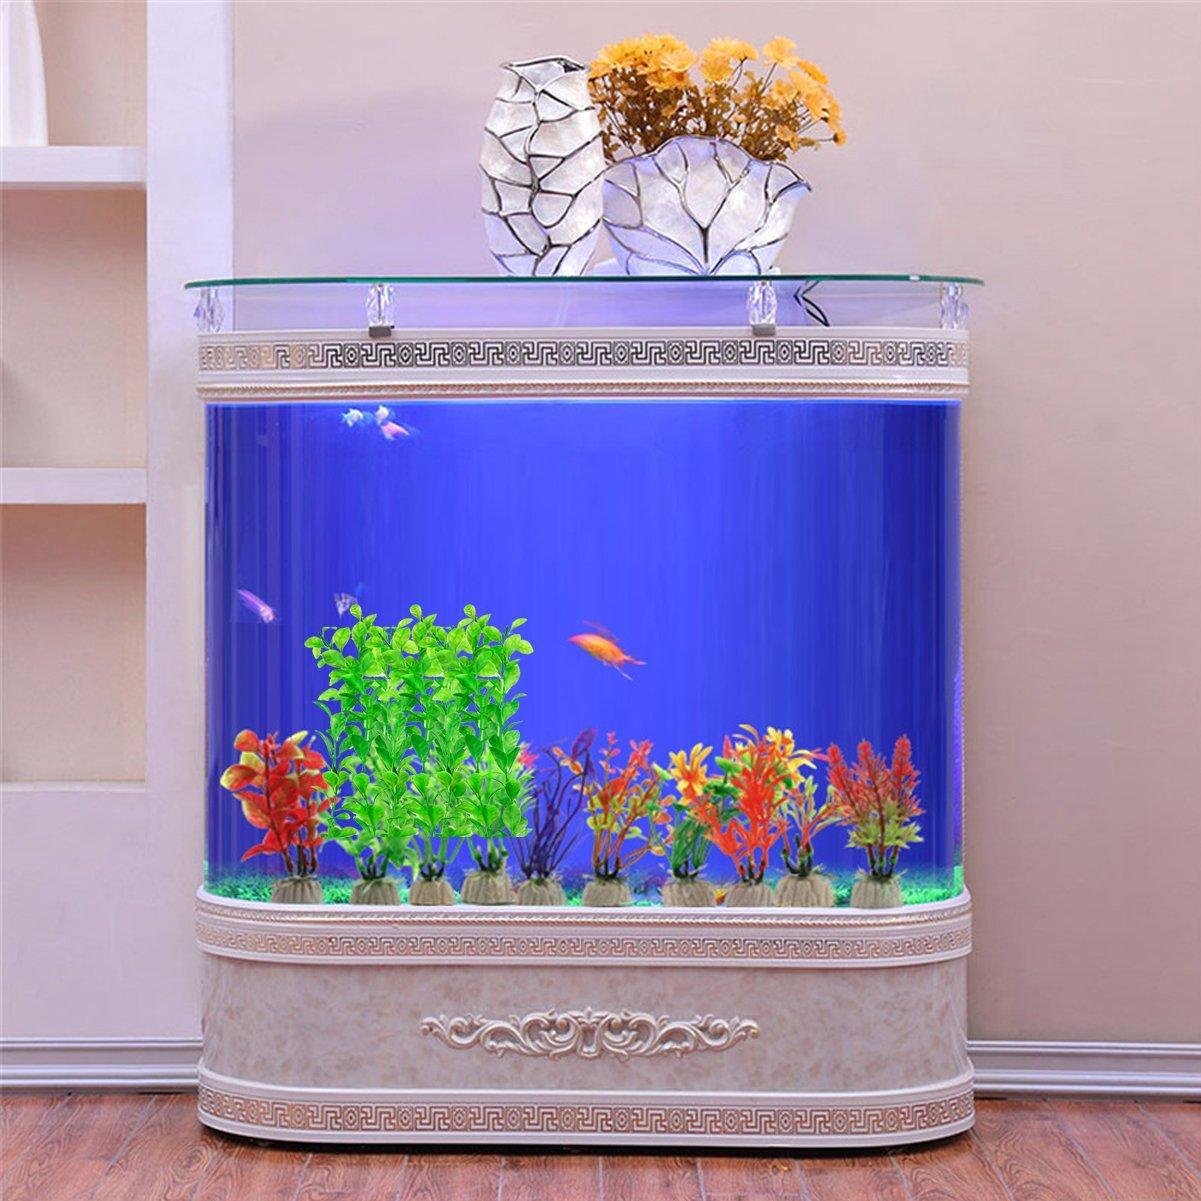 Fish Tank Decorations Home D/écor Plastic Green COMSUN 4 Pack Artificial Aquarium Plants Large Size 10.6 inch Approximate Height